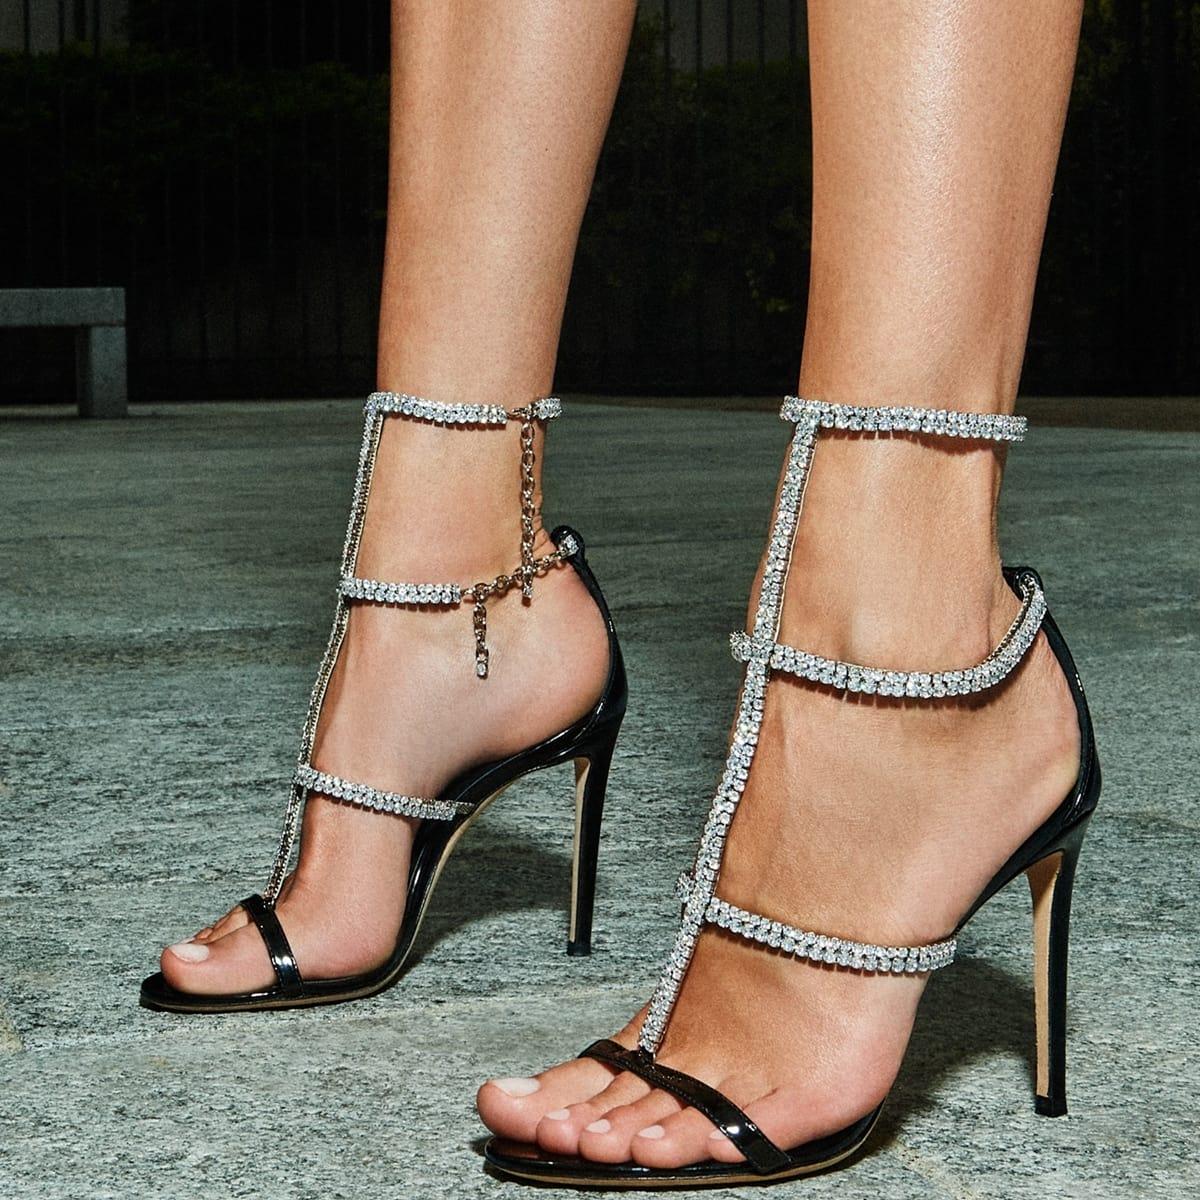 Dixie D'Amelio added height with Giuseppe Zanotti's Shaula open-toe sandals